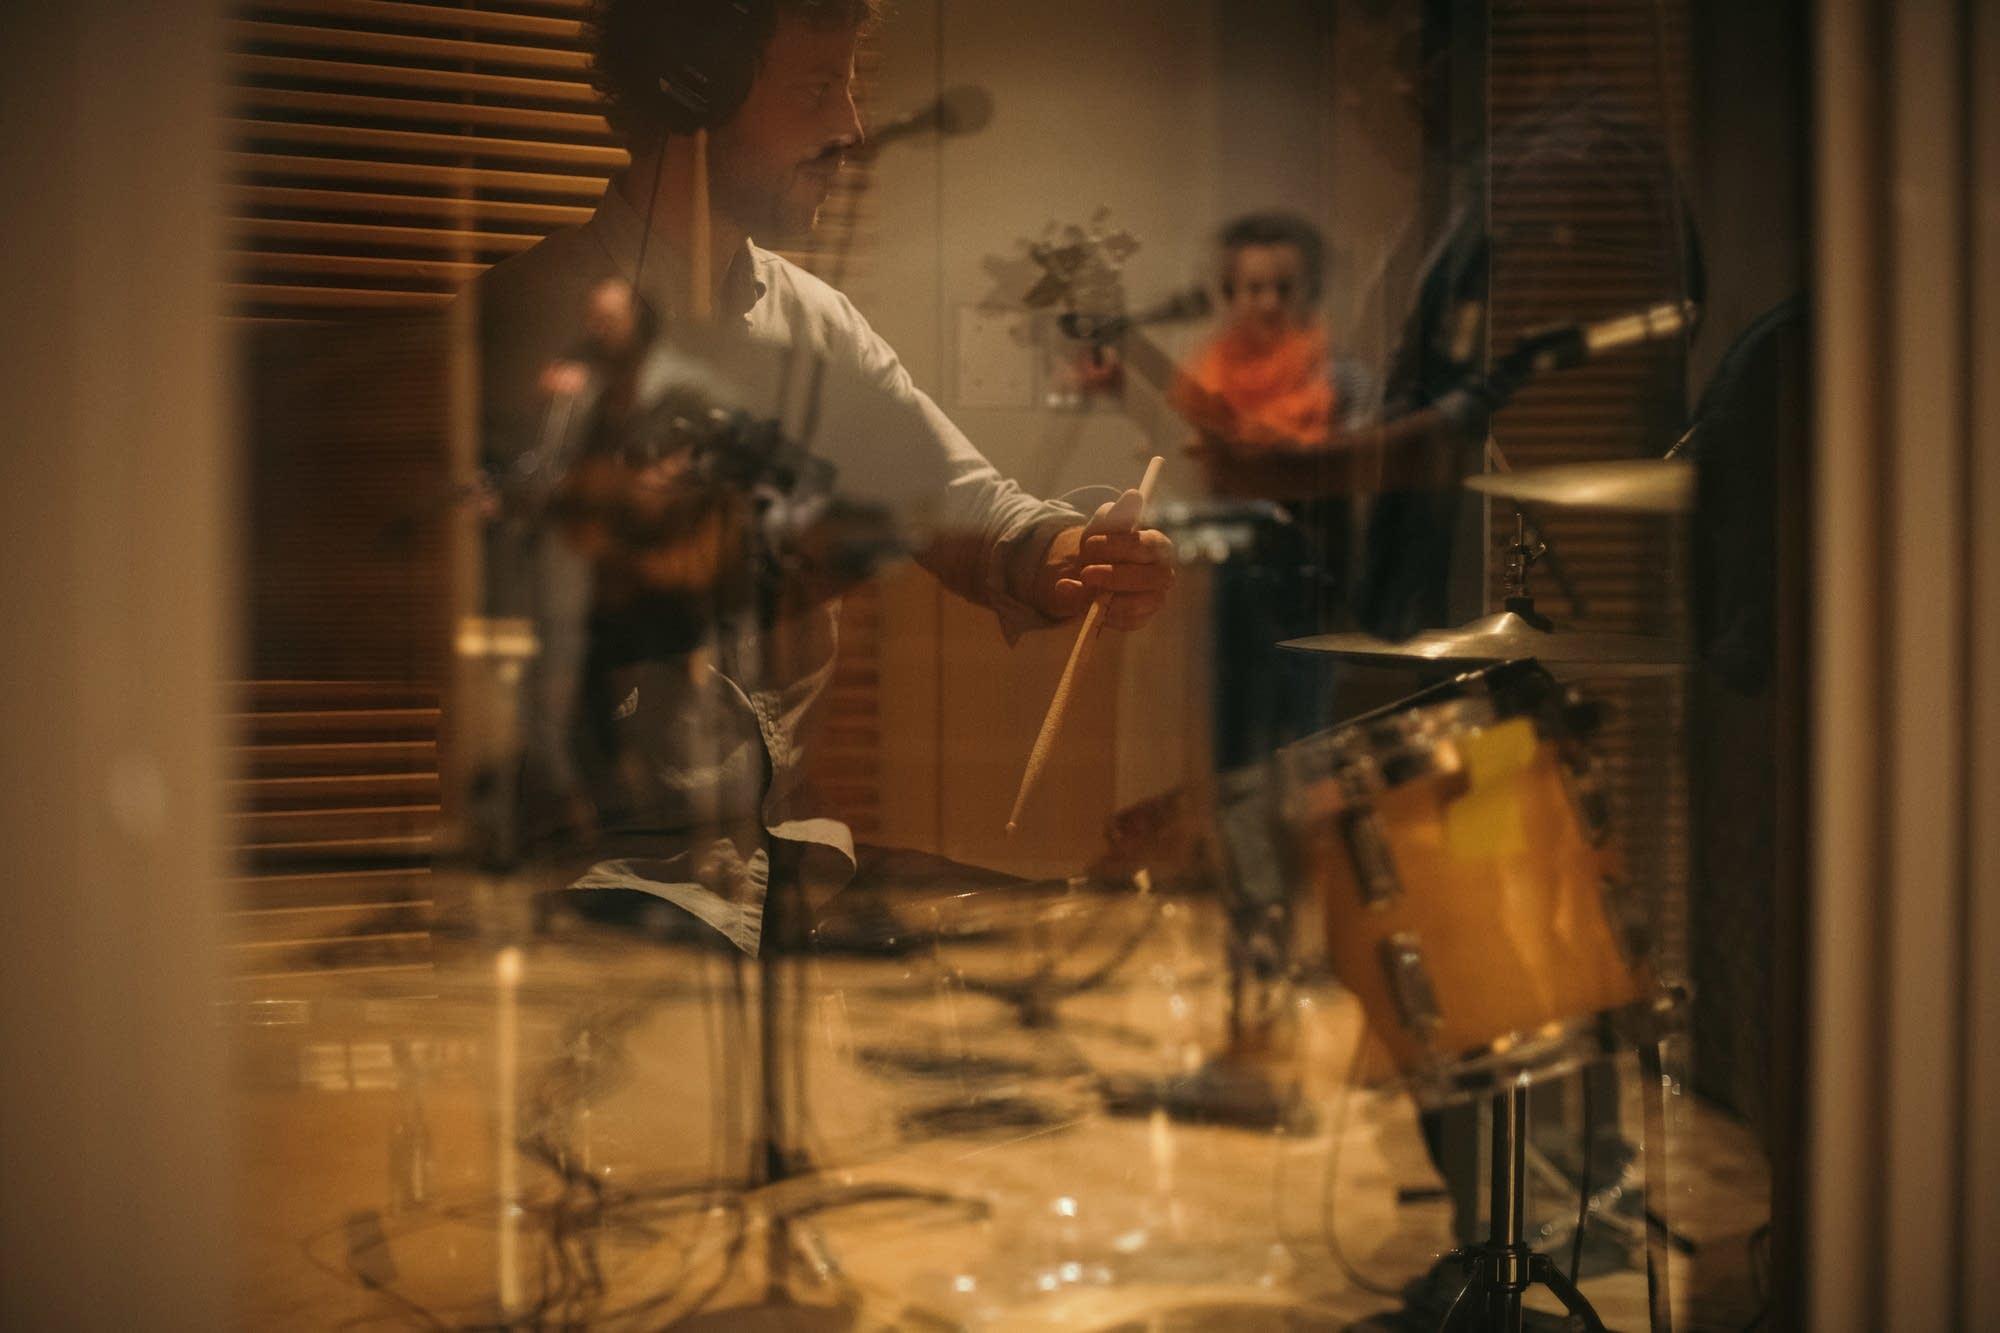 Hiss Golden Messenger perform in The Current studio